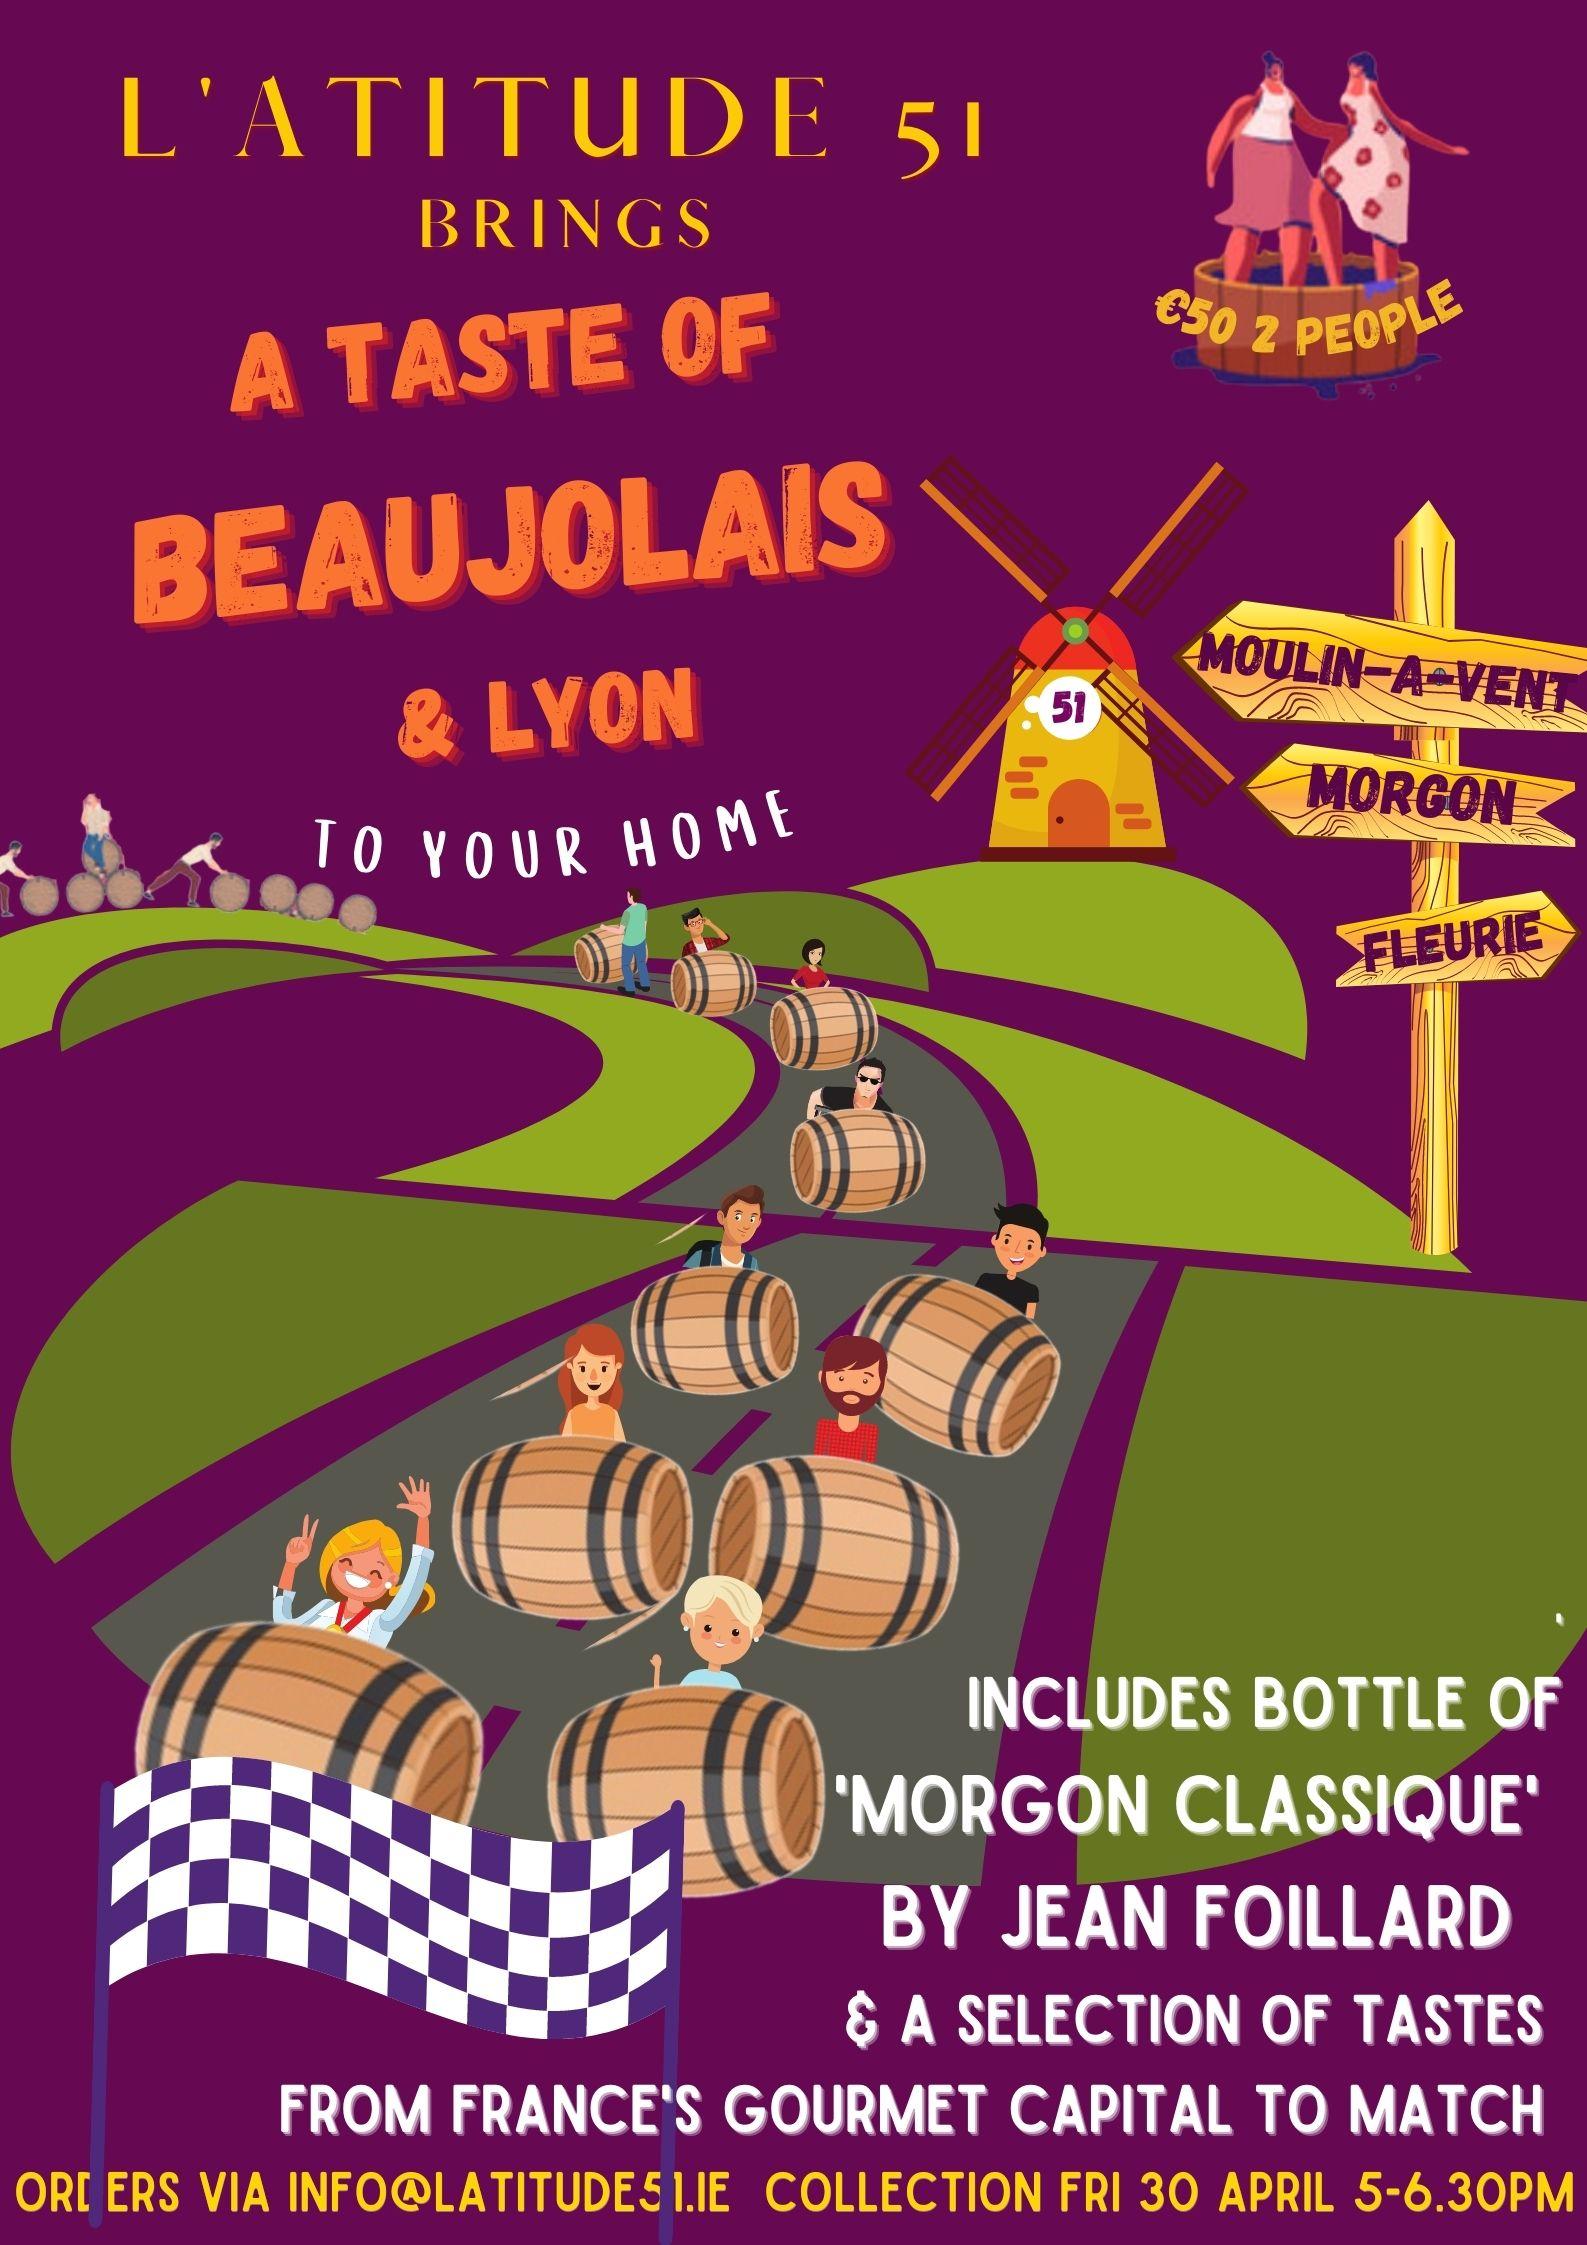 A Taste of Beaujolais